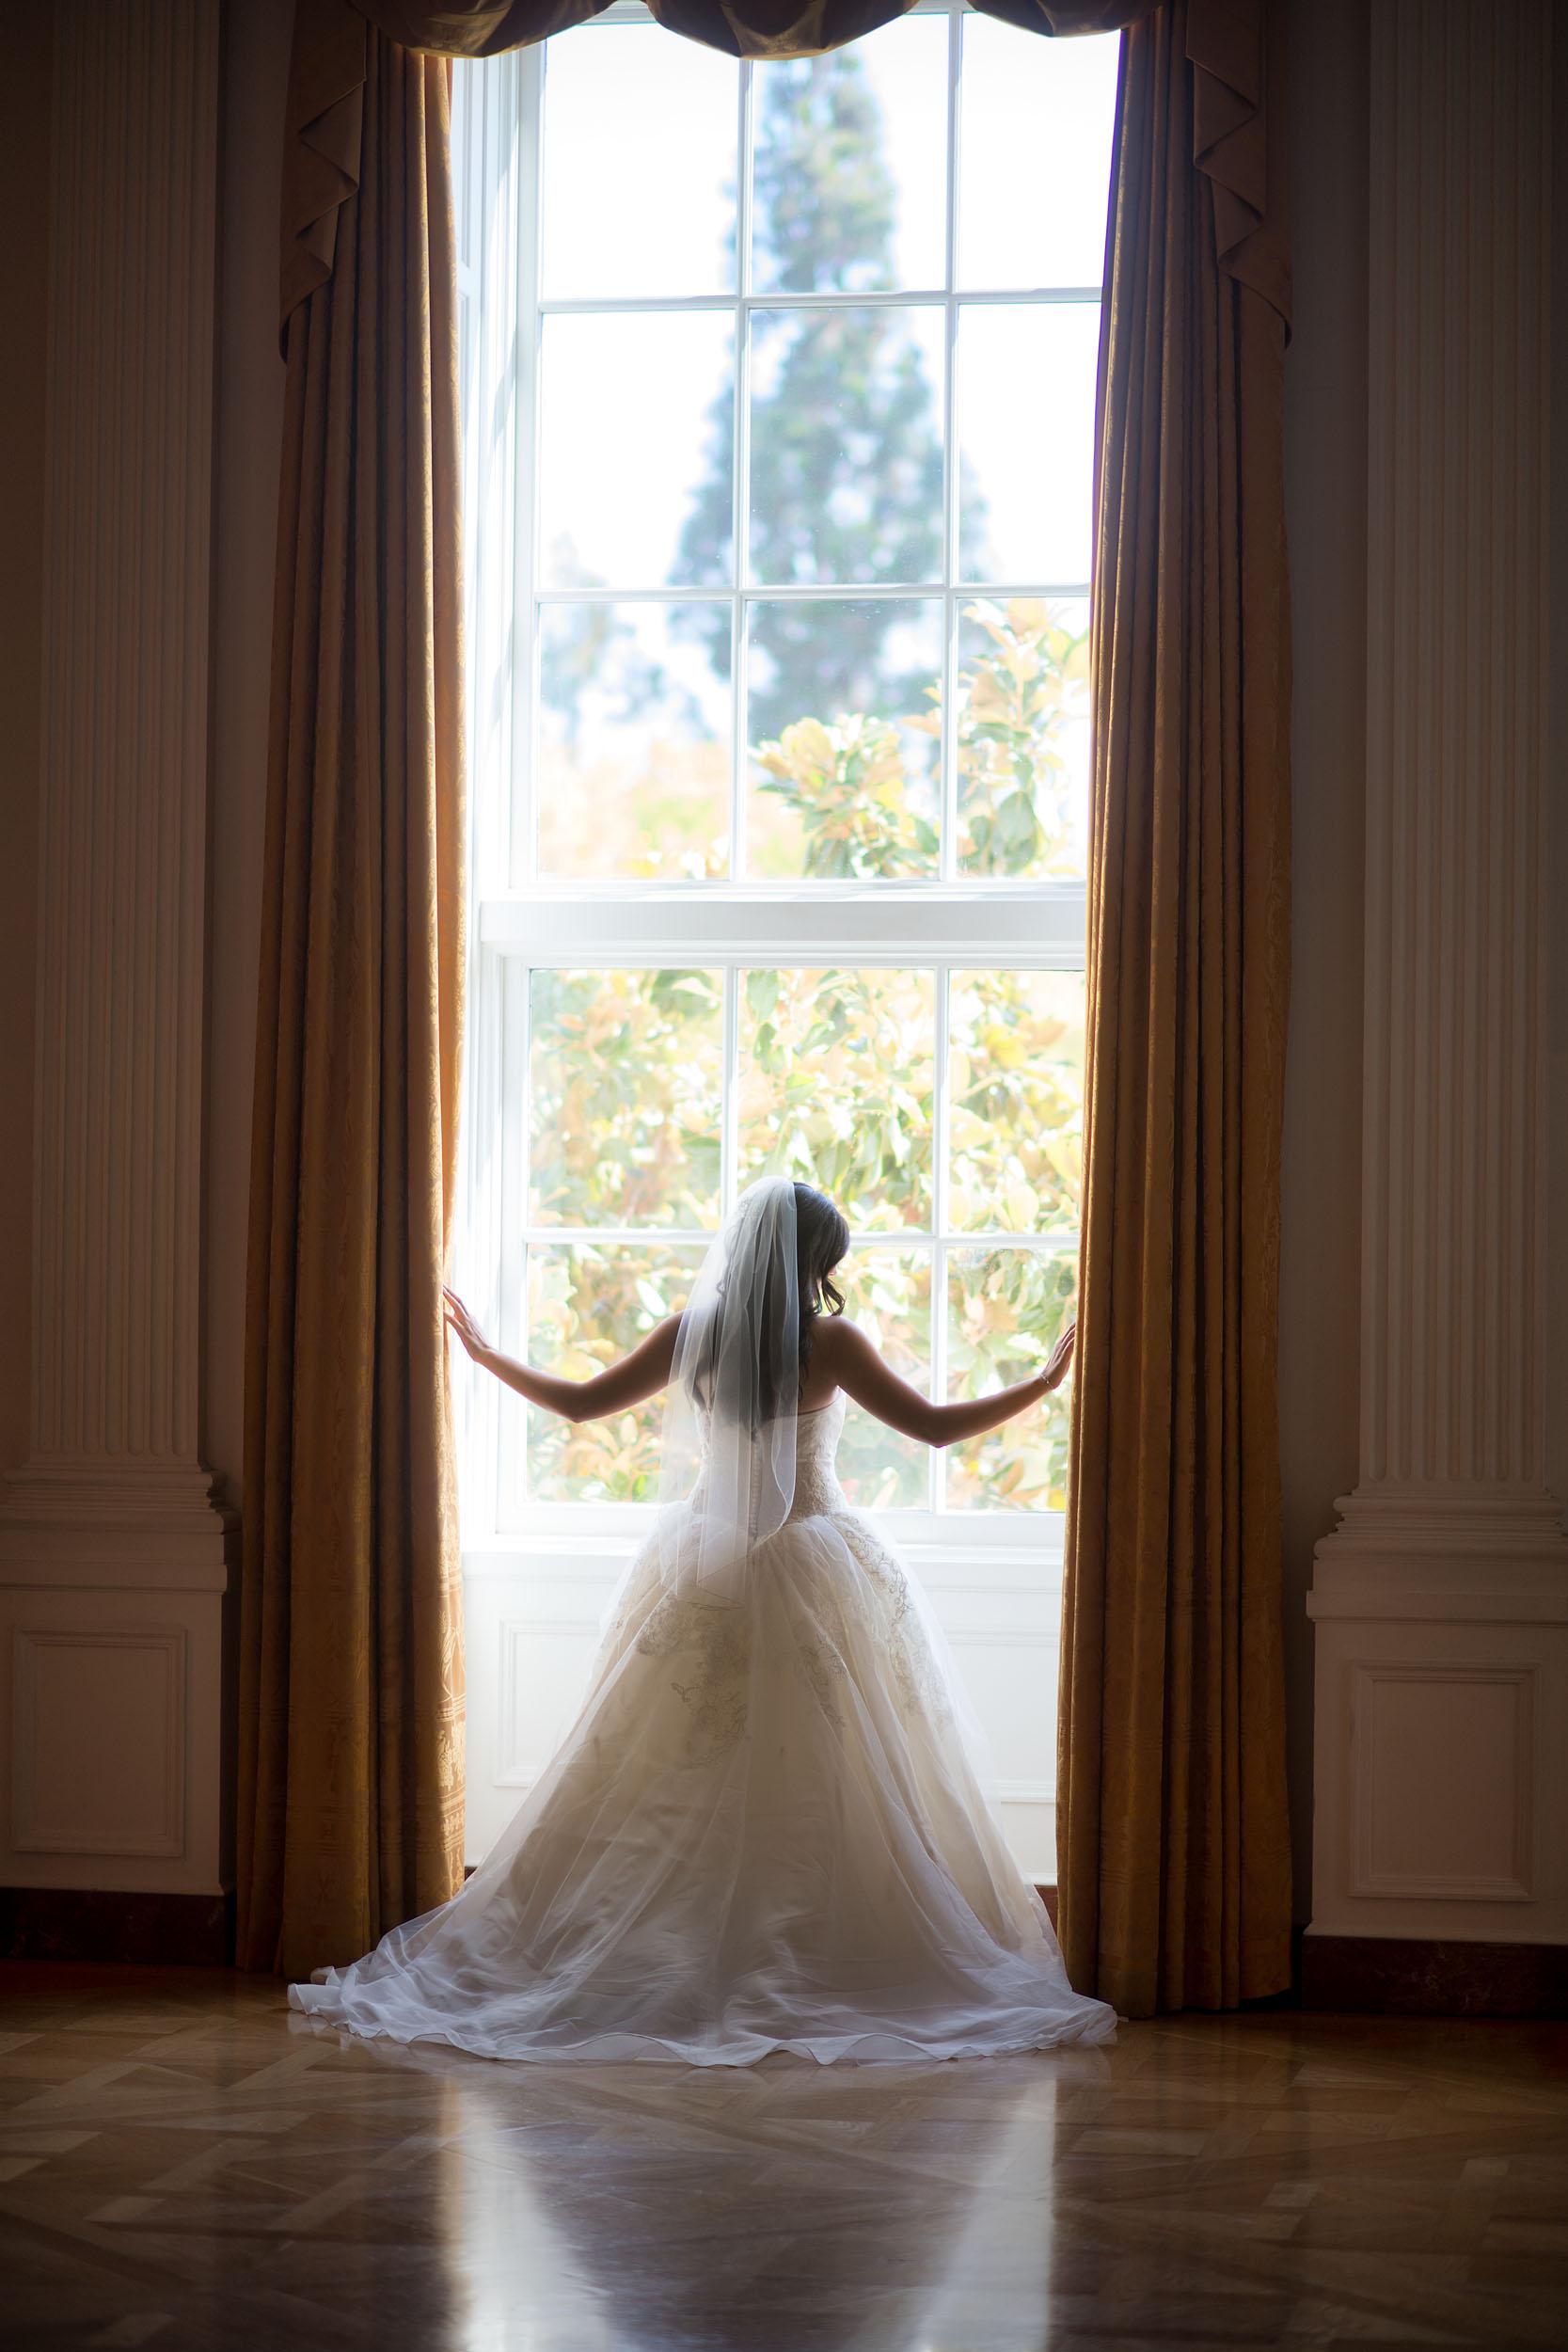 Bride backlit in window at the Richard Nixon Presidential Library & Museum in Yorba Linda.